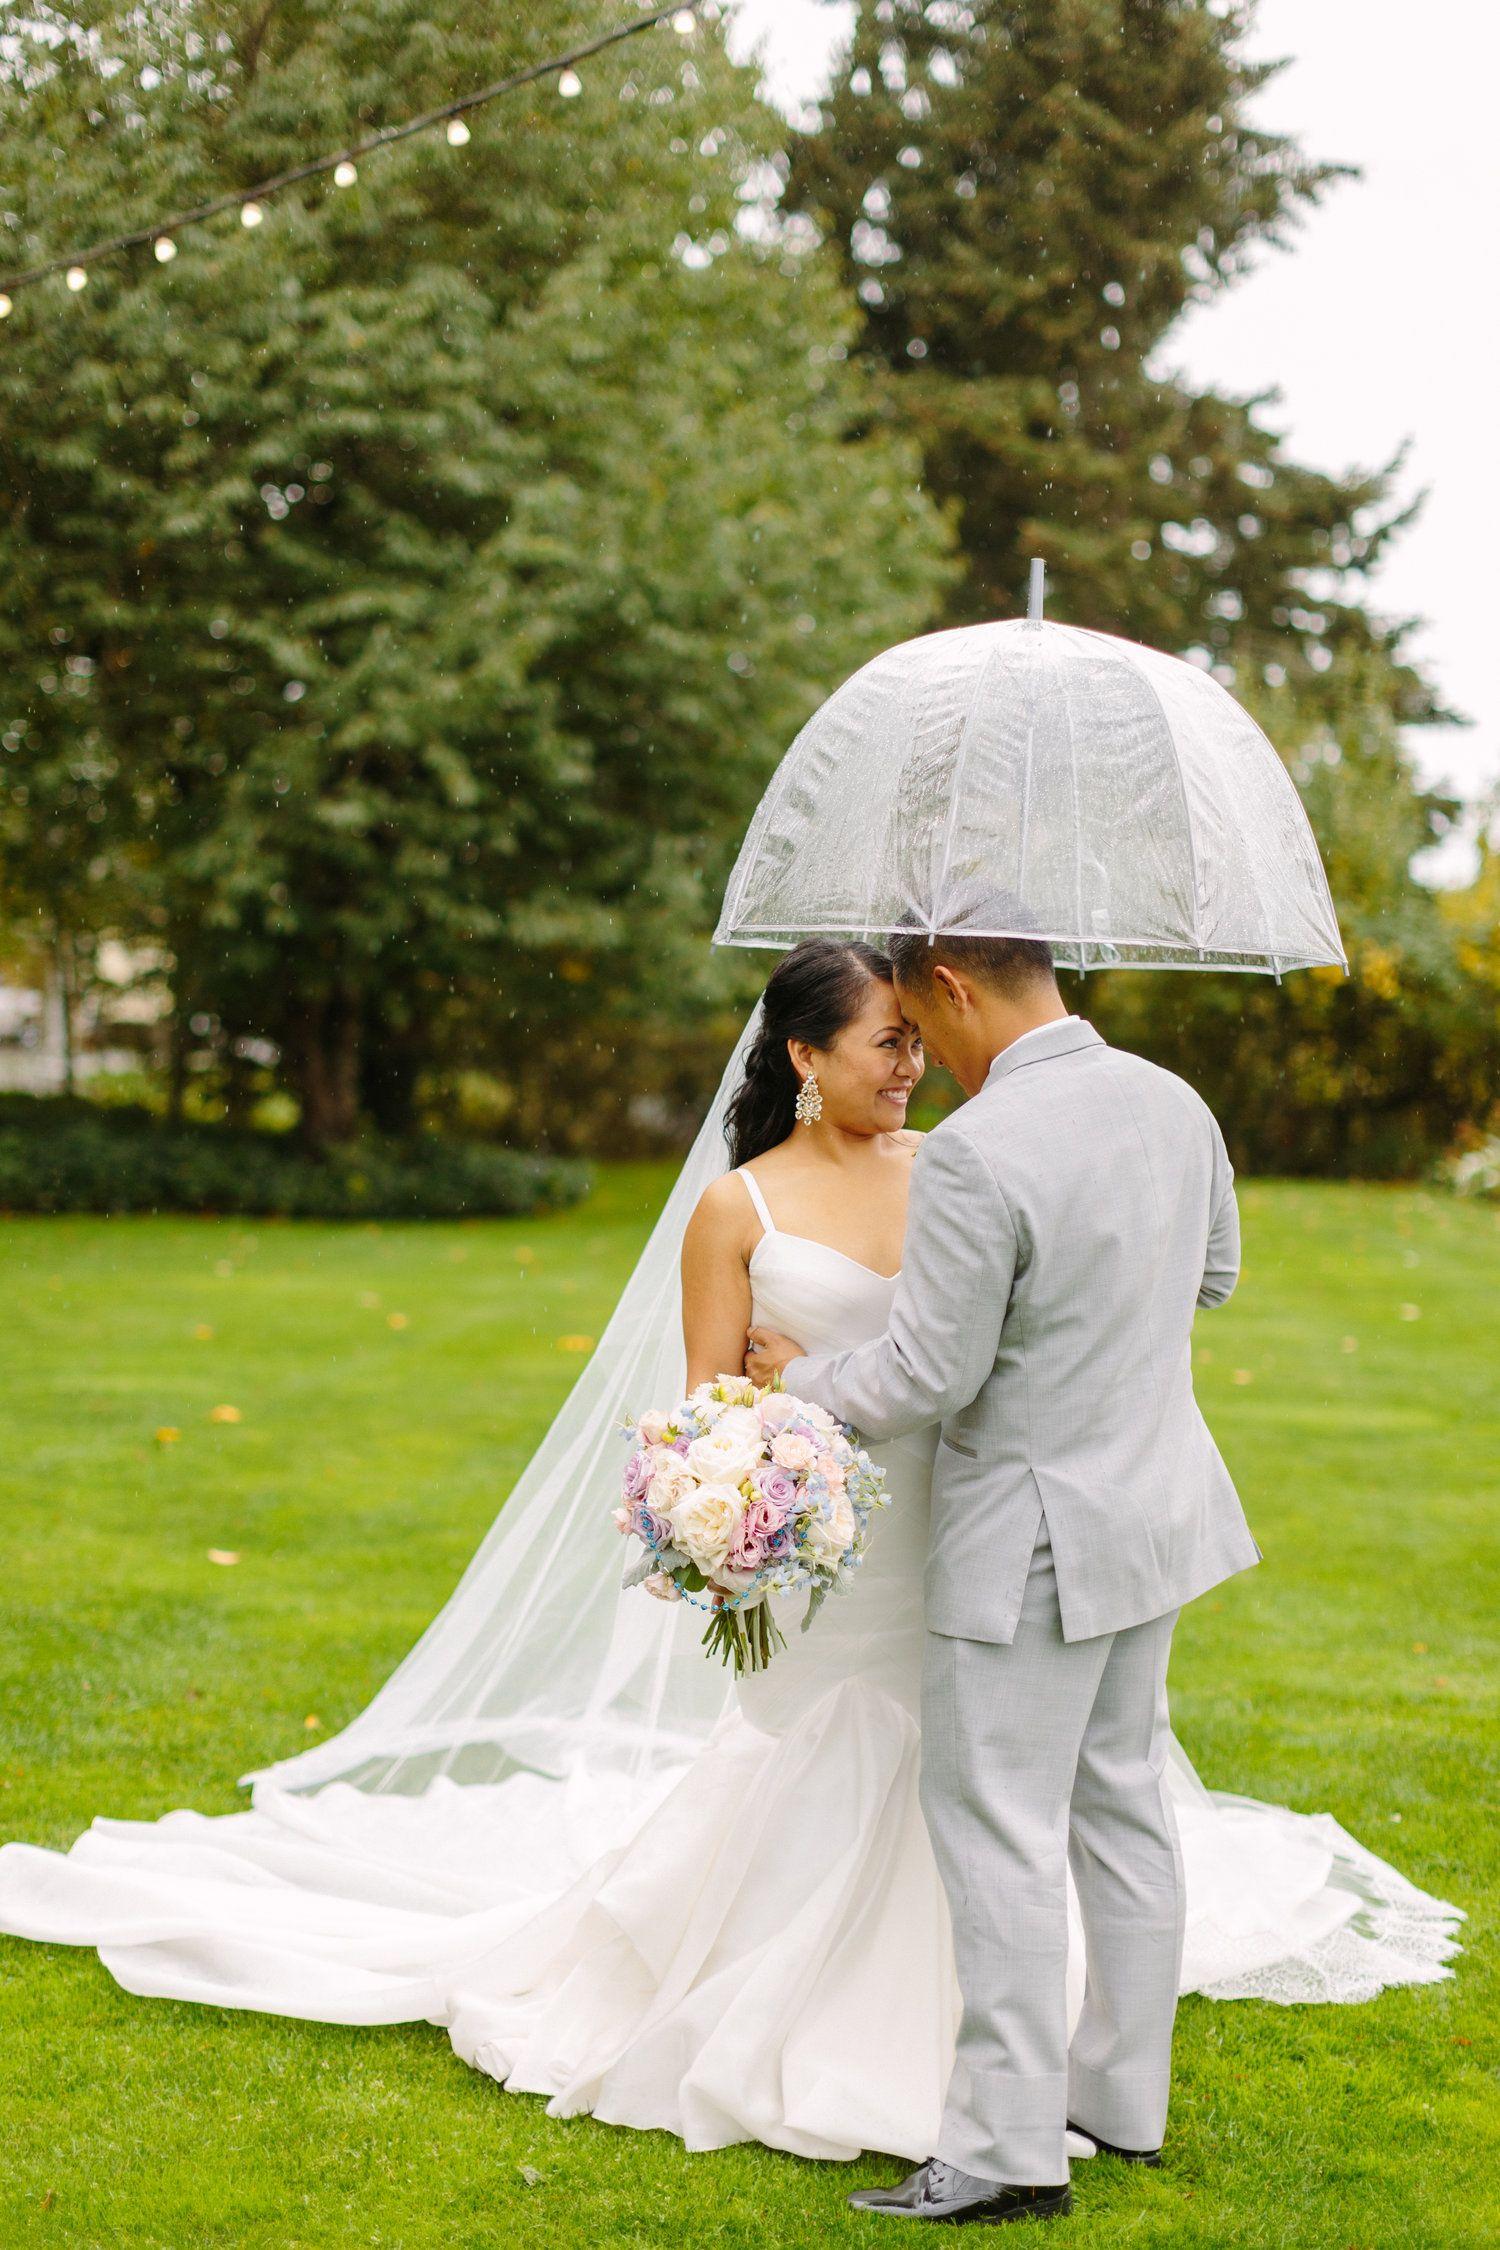 Gown:Carol Hannah Pherousa(simplified).Filagree Garden Veil|Photography:Courtney Bowlden| Venue:Kelley Farm